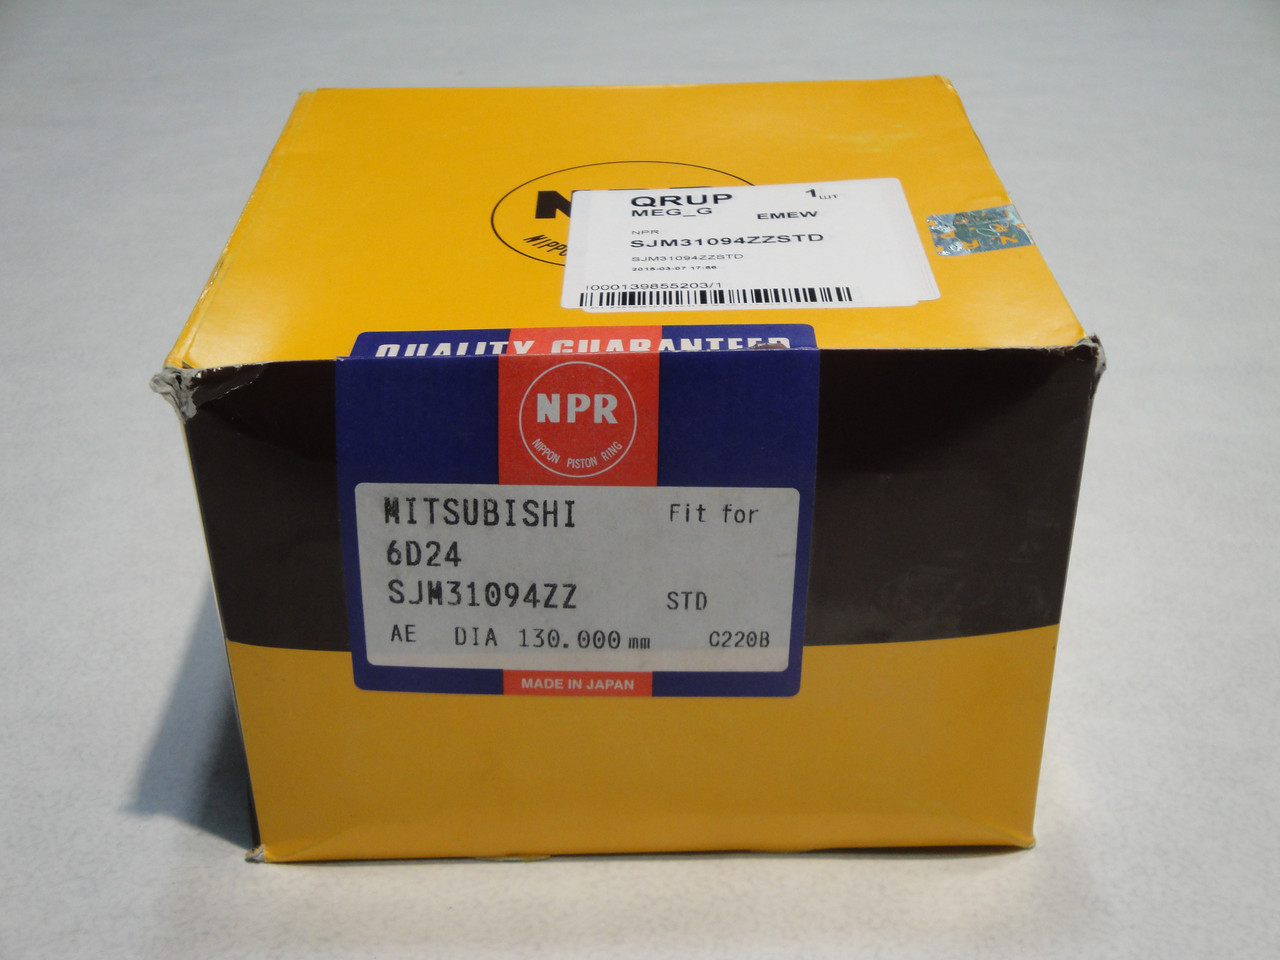 Кольца поршневые MITSUBISHI SAFIR (MITSUBISHI 6D24/6D22) (ME151190/ME996391/SJM31094ZZSTD) NPR